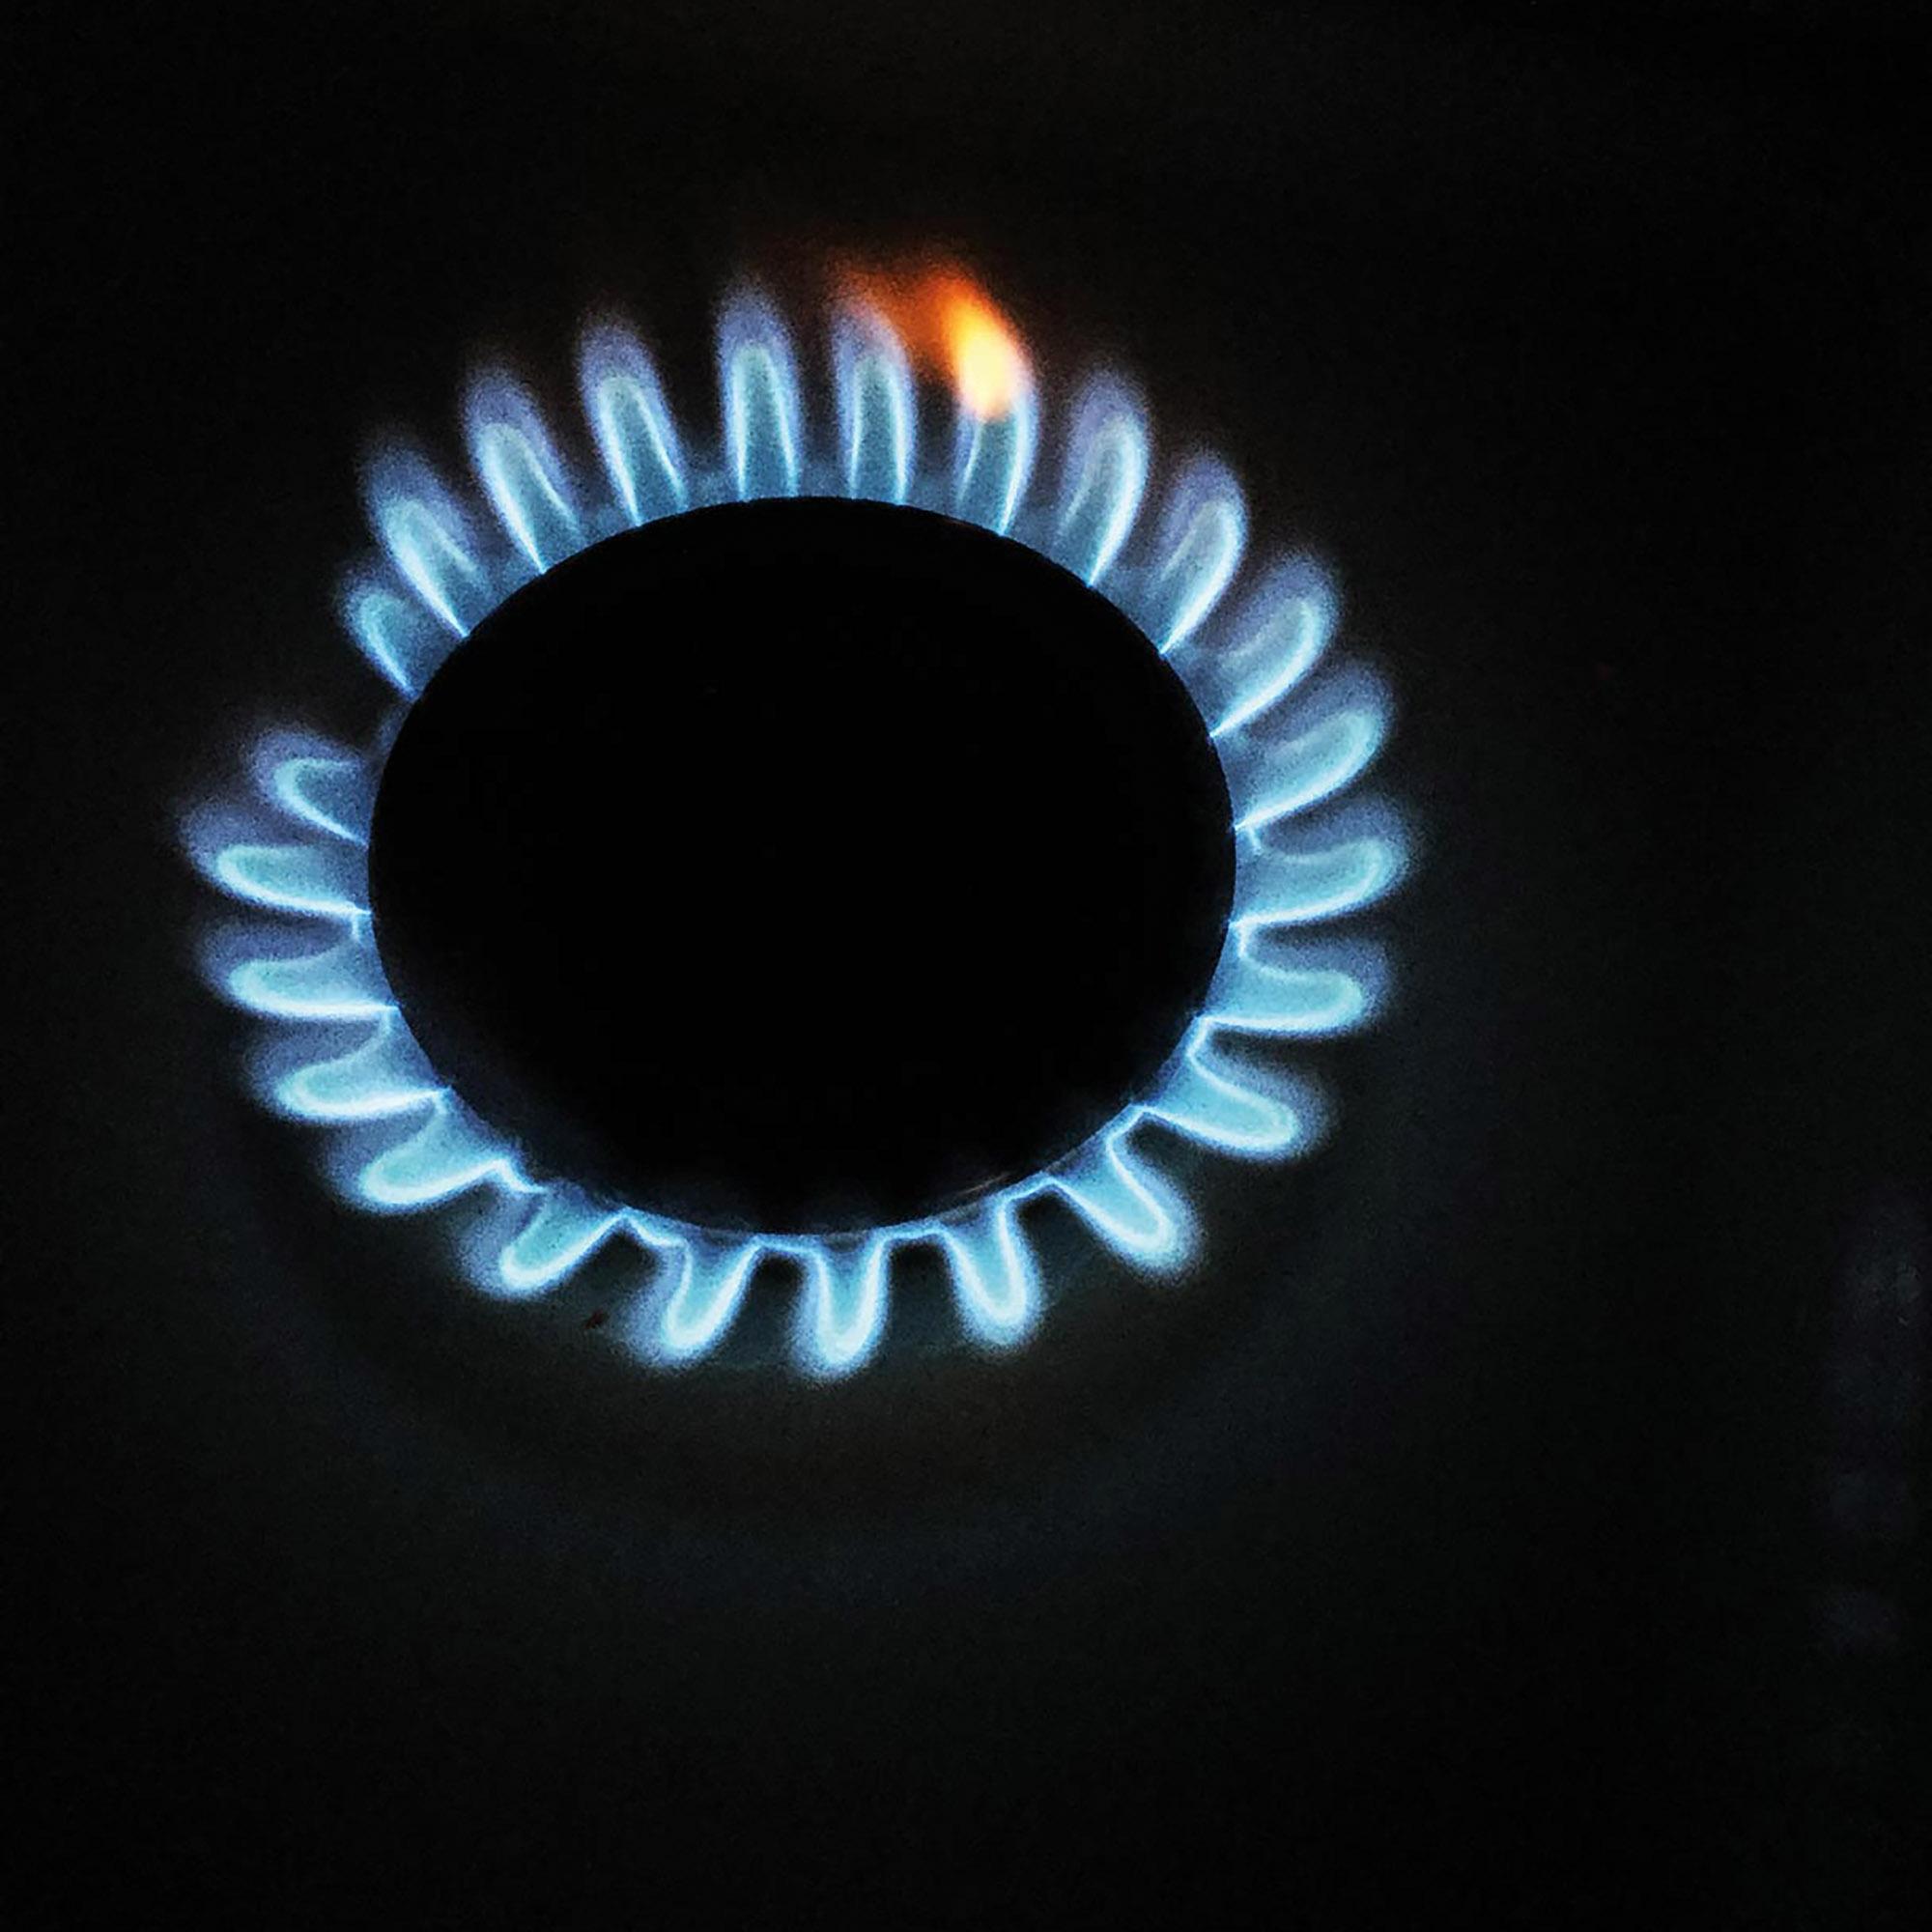 sp1_Gas-3000+x+3999-LR-Louis.jpg